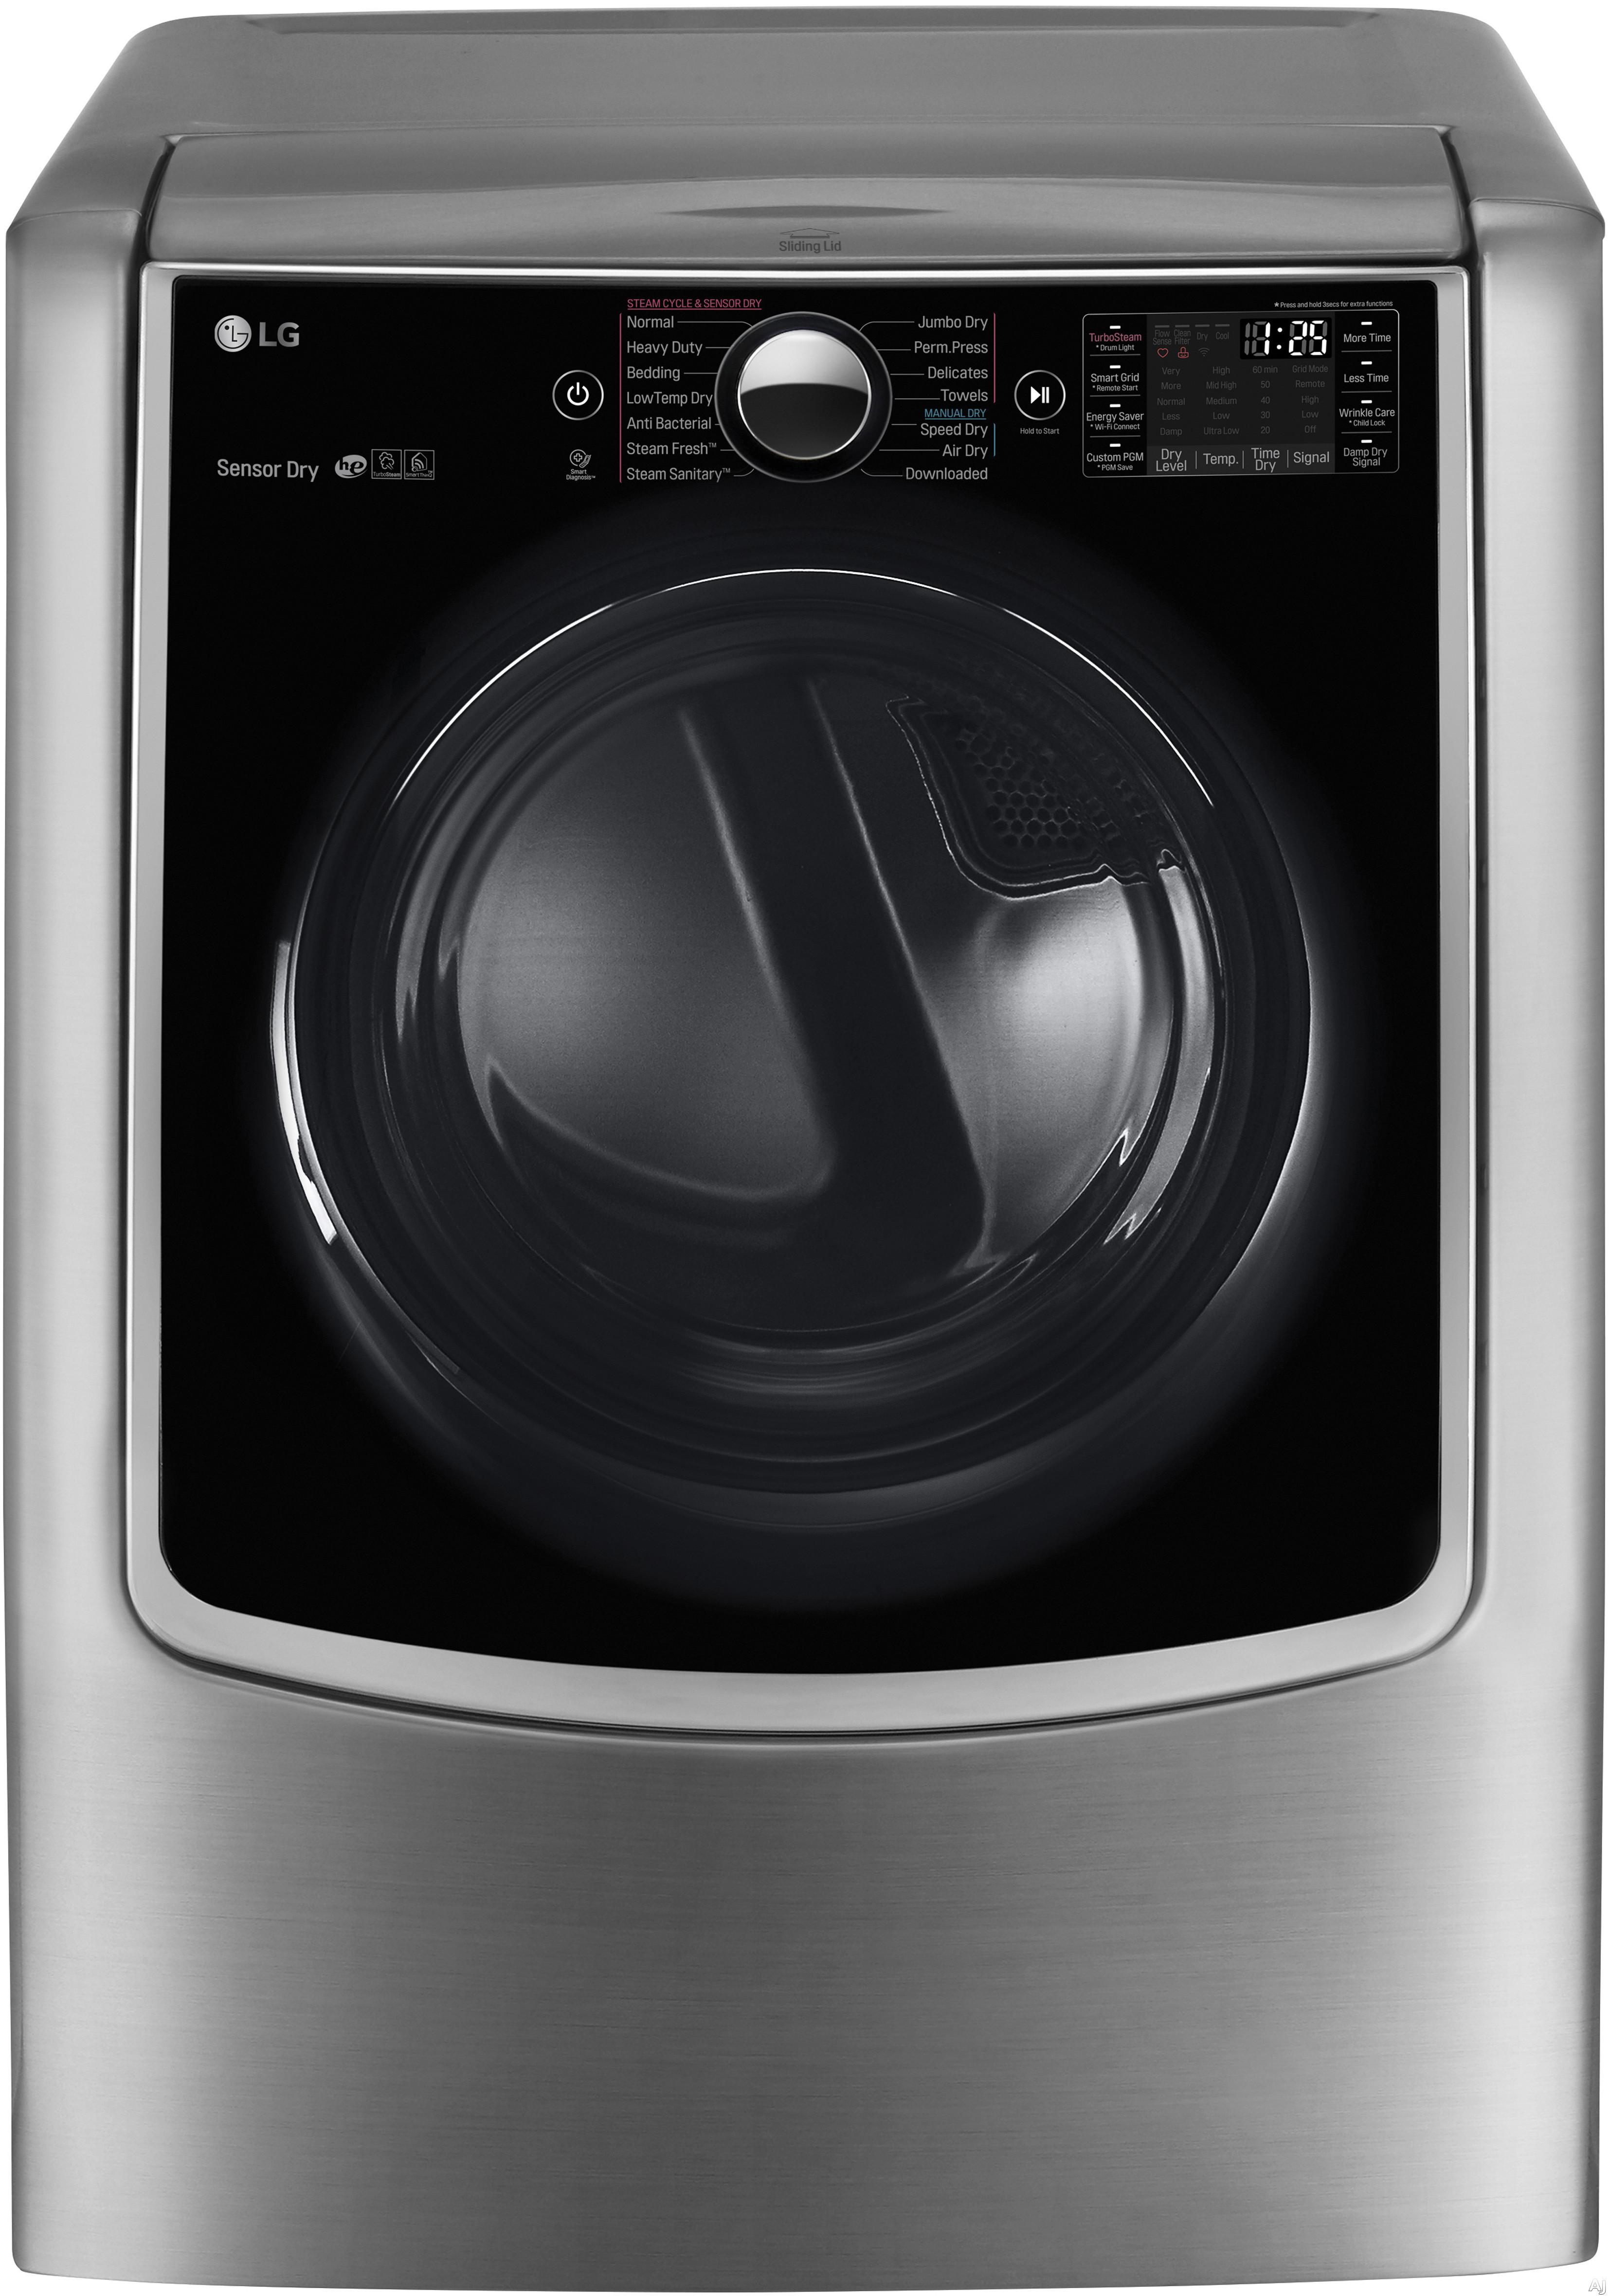 LG Laundry,LG Dryers,LG Gas Dryers